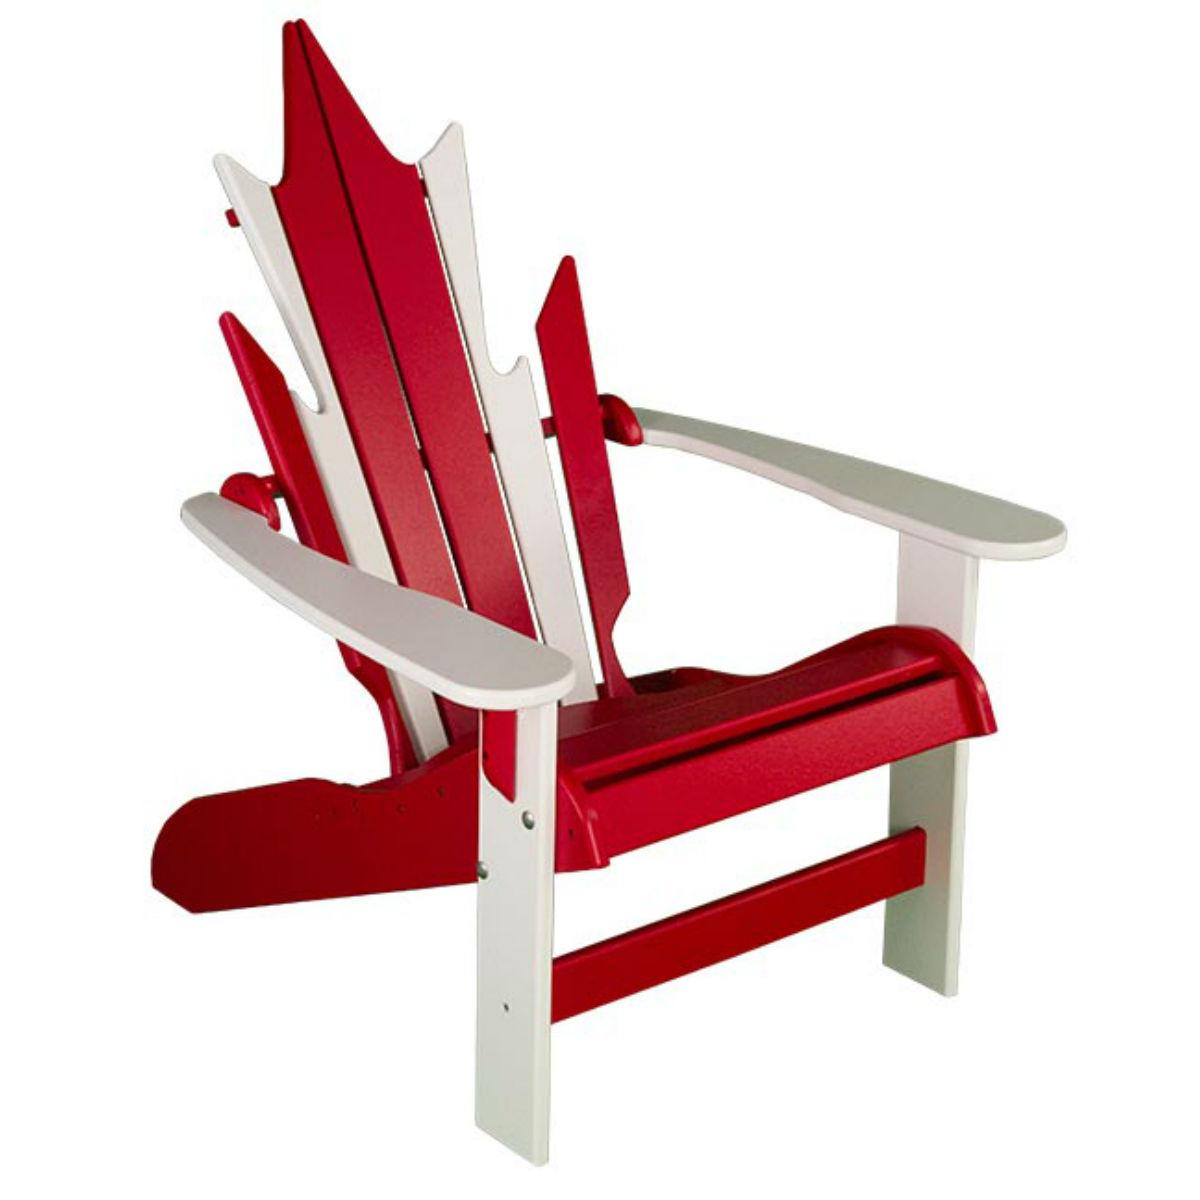 Maple Leaf Muskoka Chair Canadian Pride Recycled